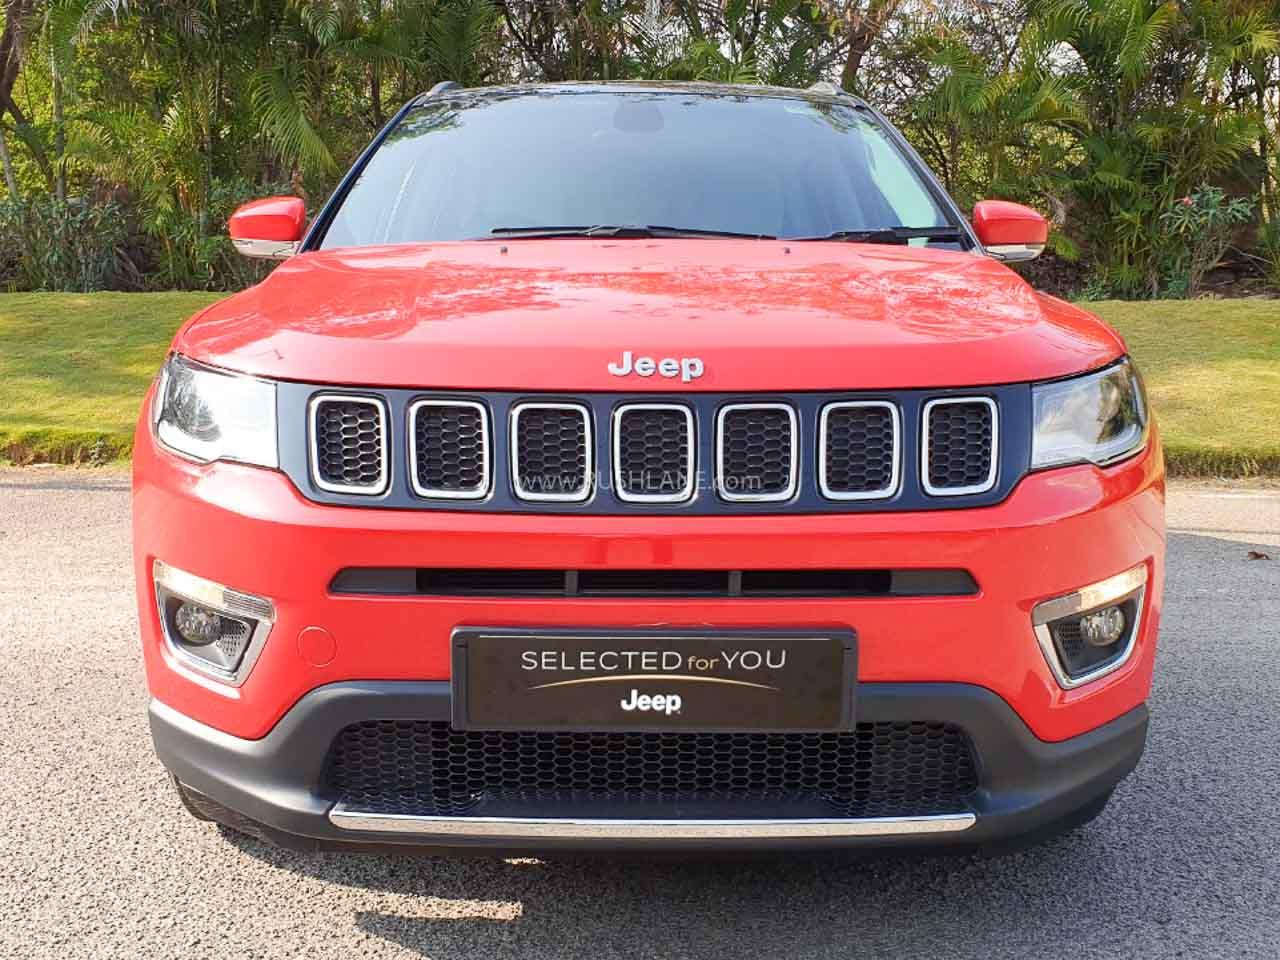 Jeep SelectedForYou